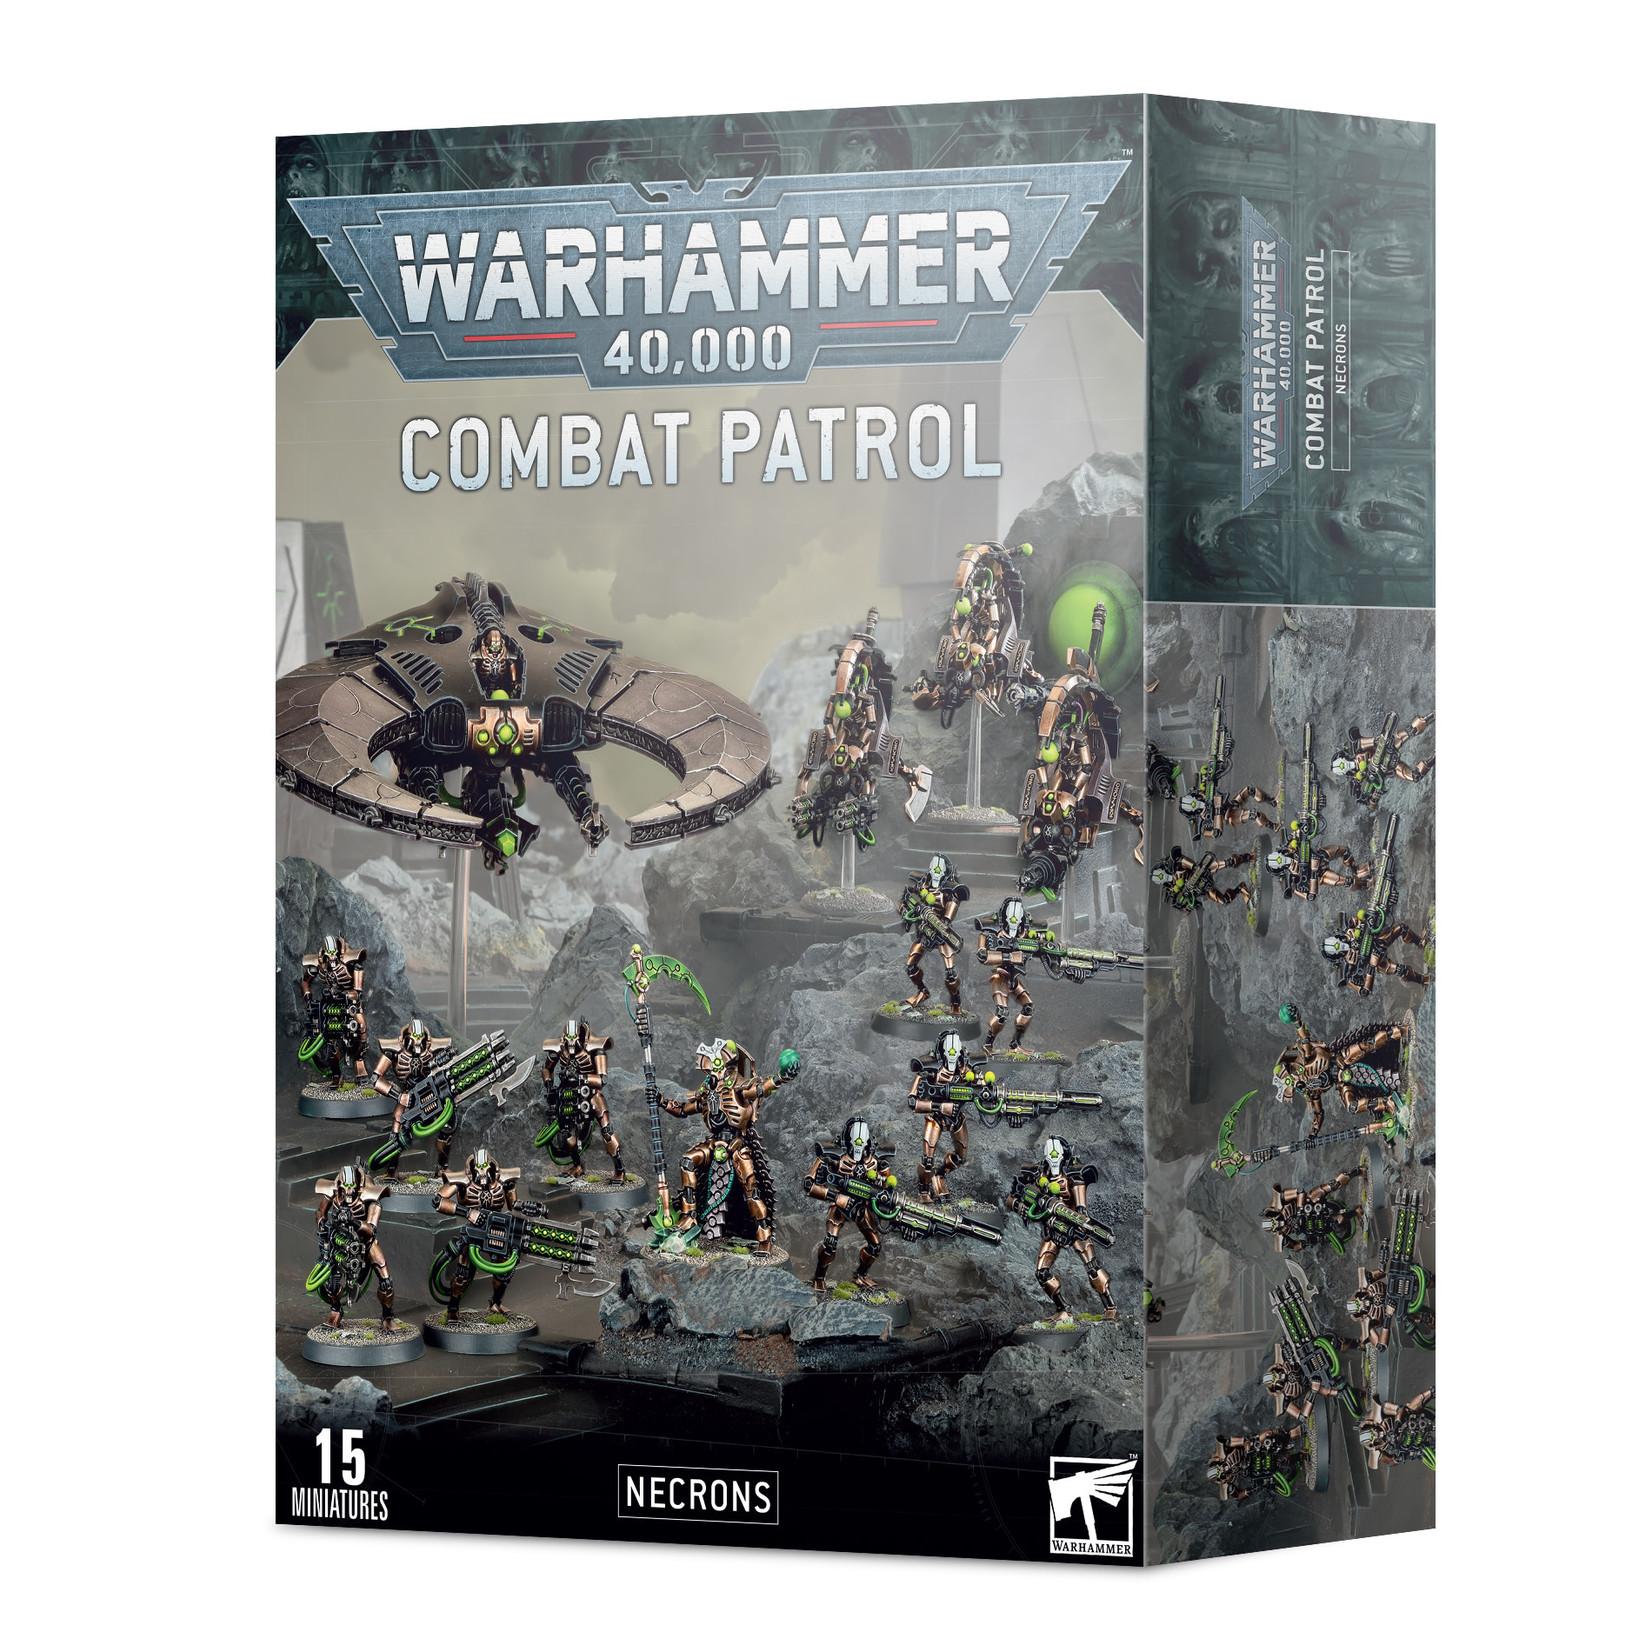 Warhammer 40K Combat Patrol Necrons